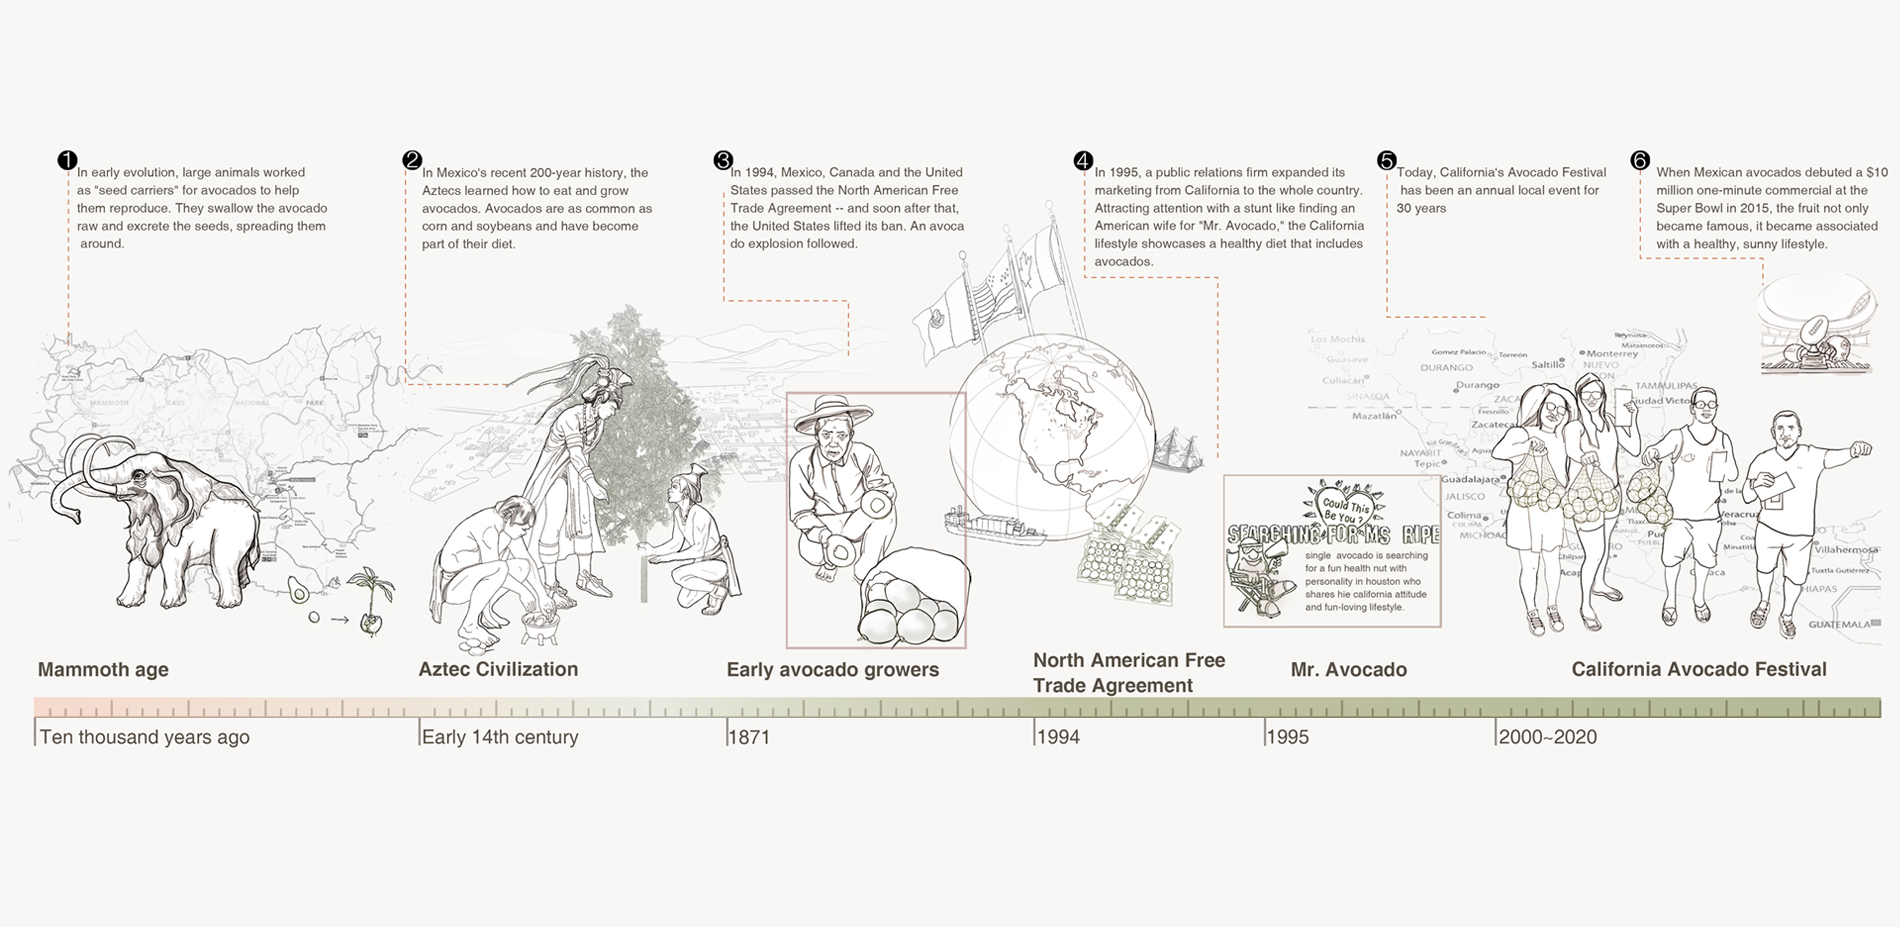 History of avocado planting